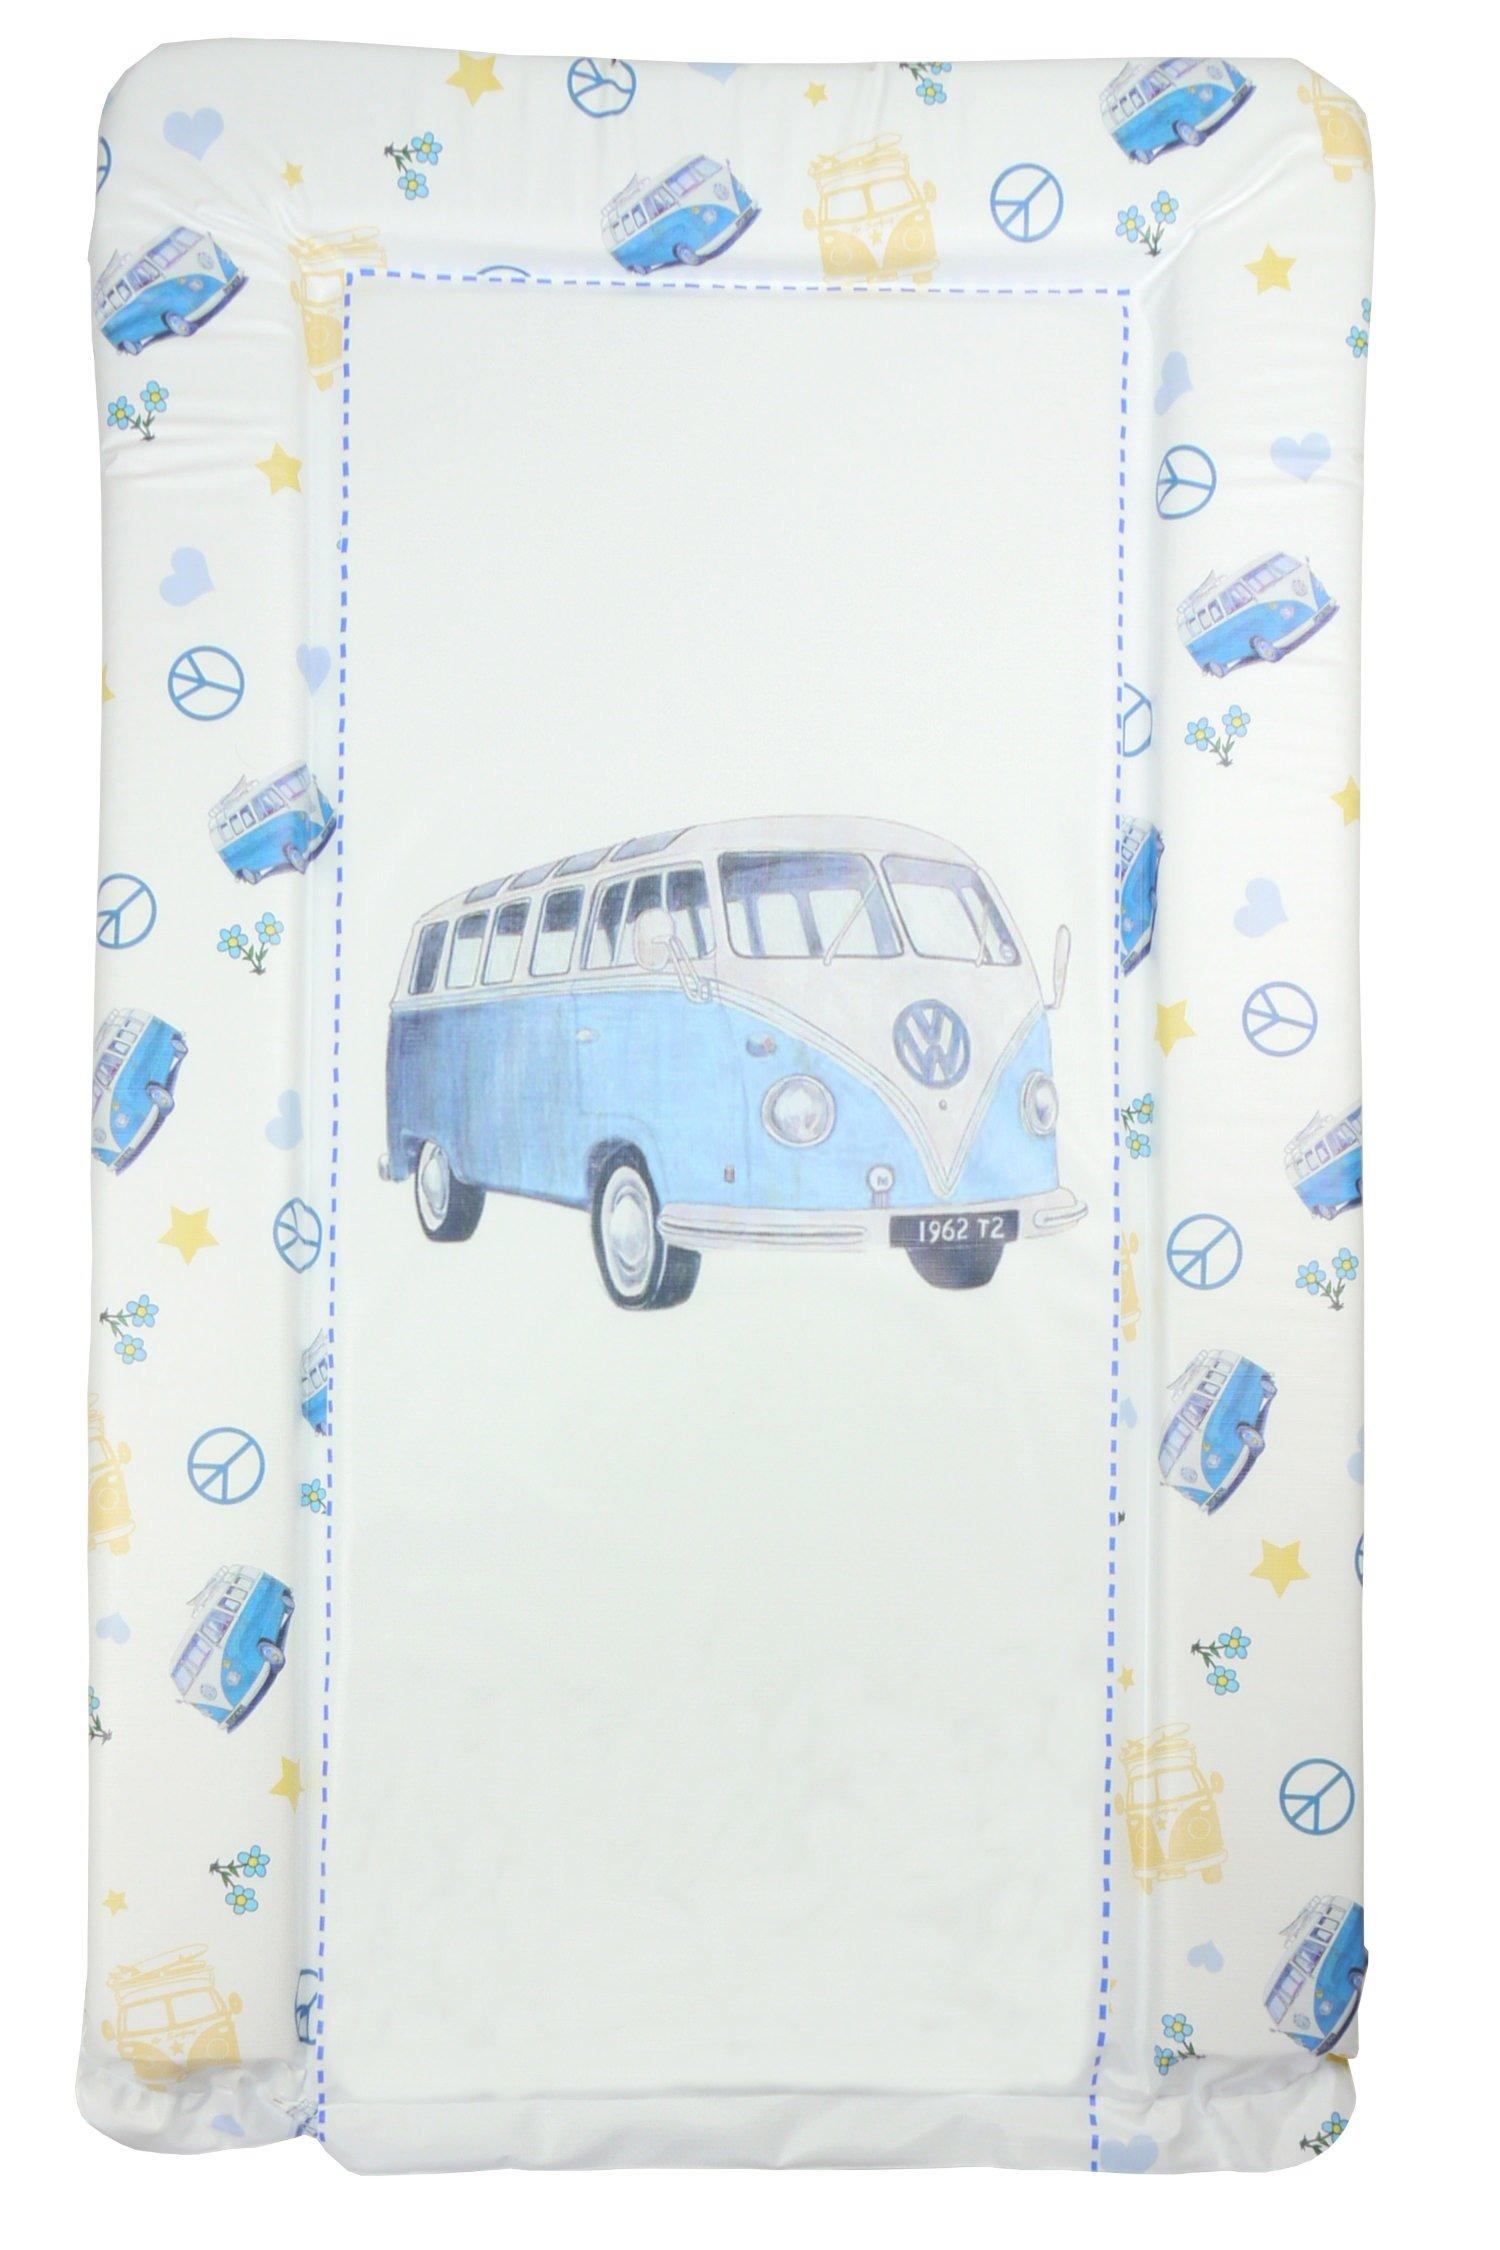 Blue VW Camper Van Baby Changing Mat - Blue Camper by Babywise